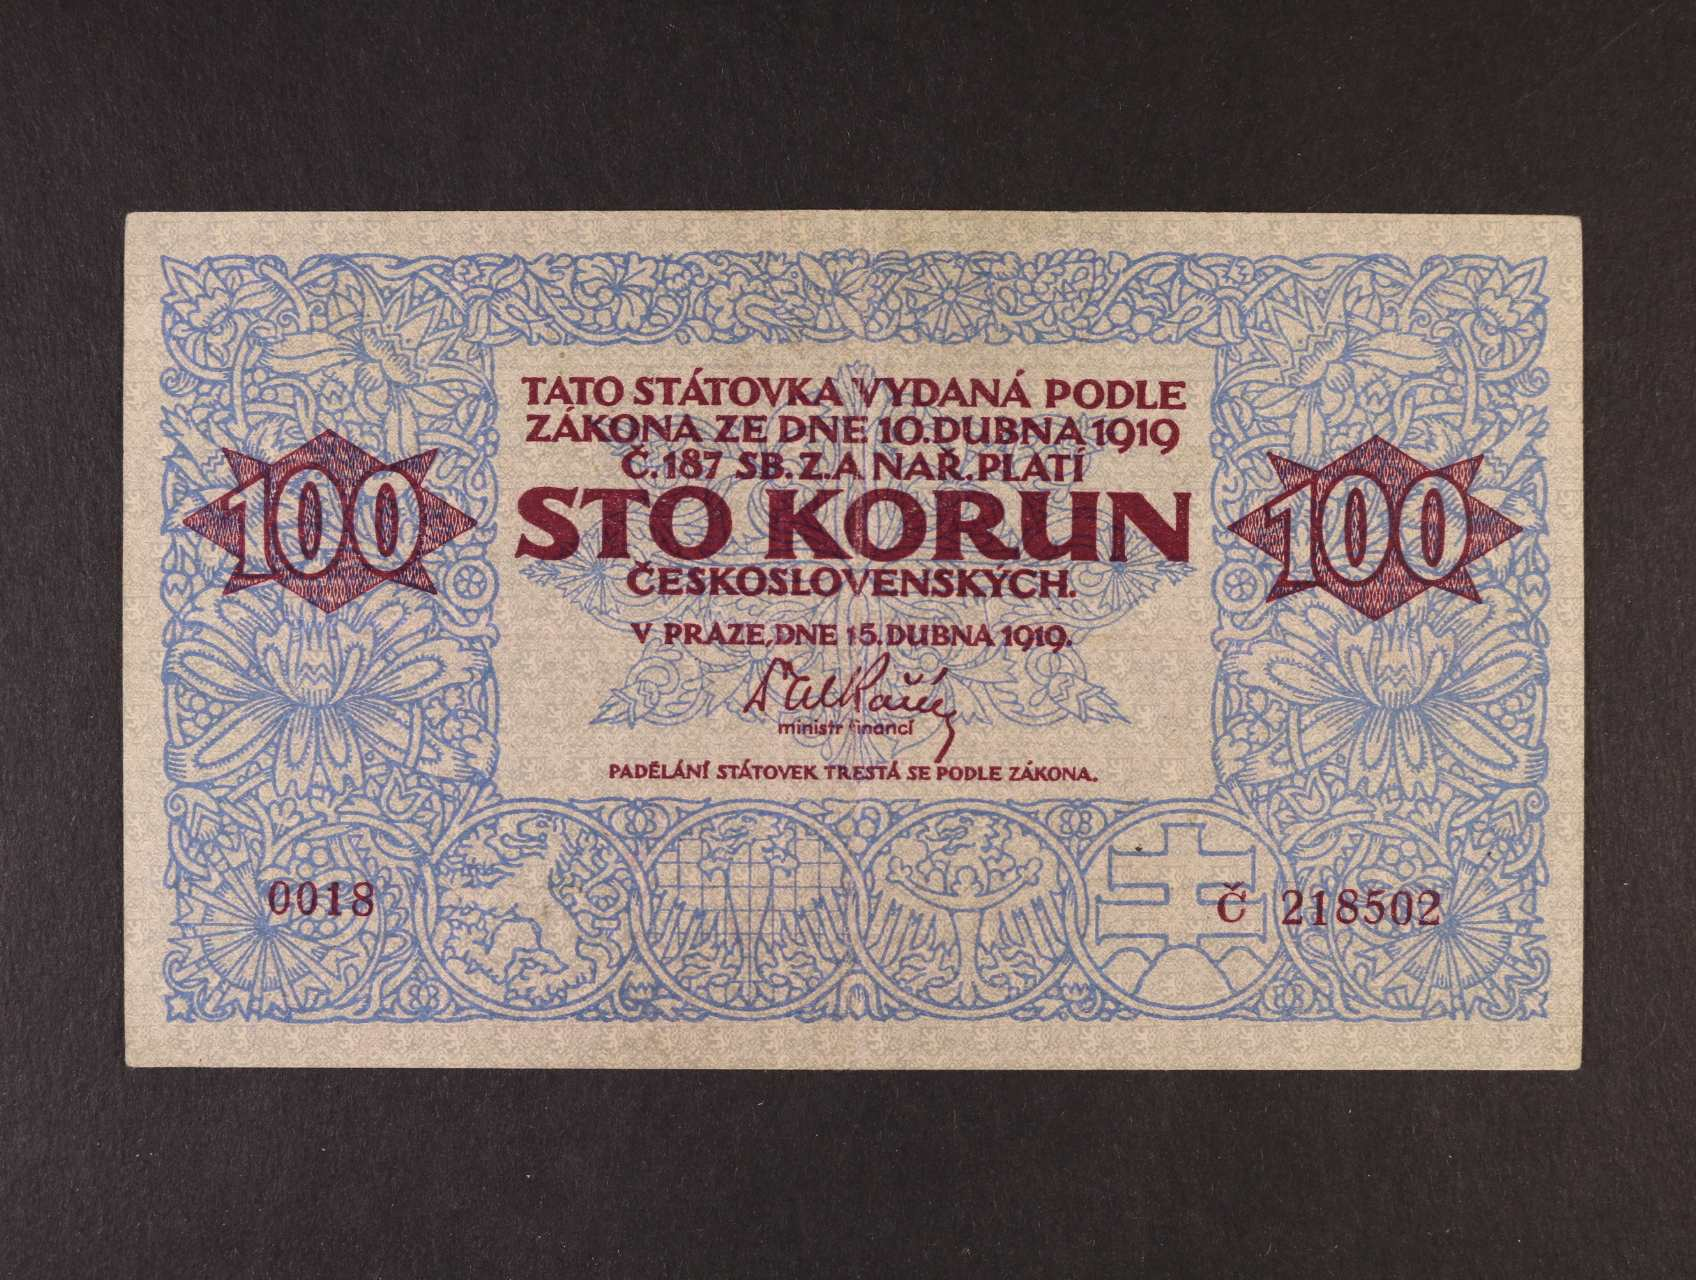 100 Kč 15.4.1919 série 0018, Ba. 12, Pi. 11